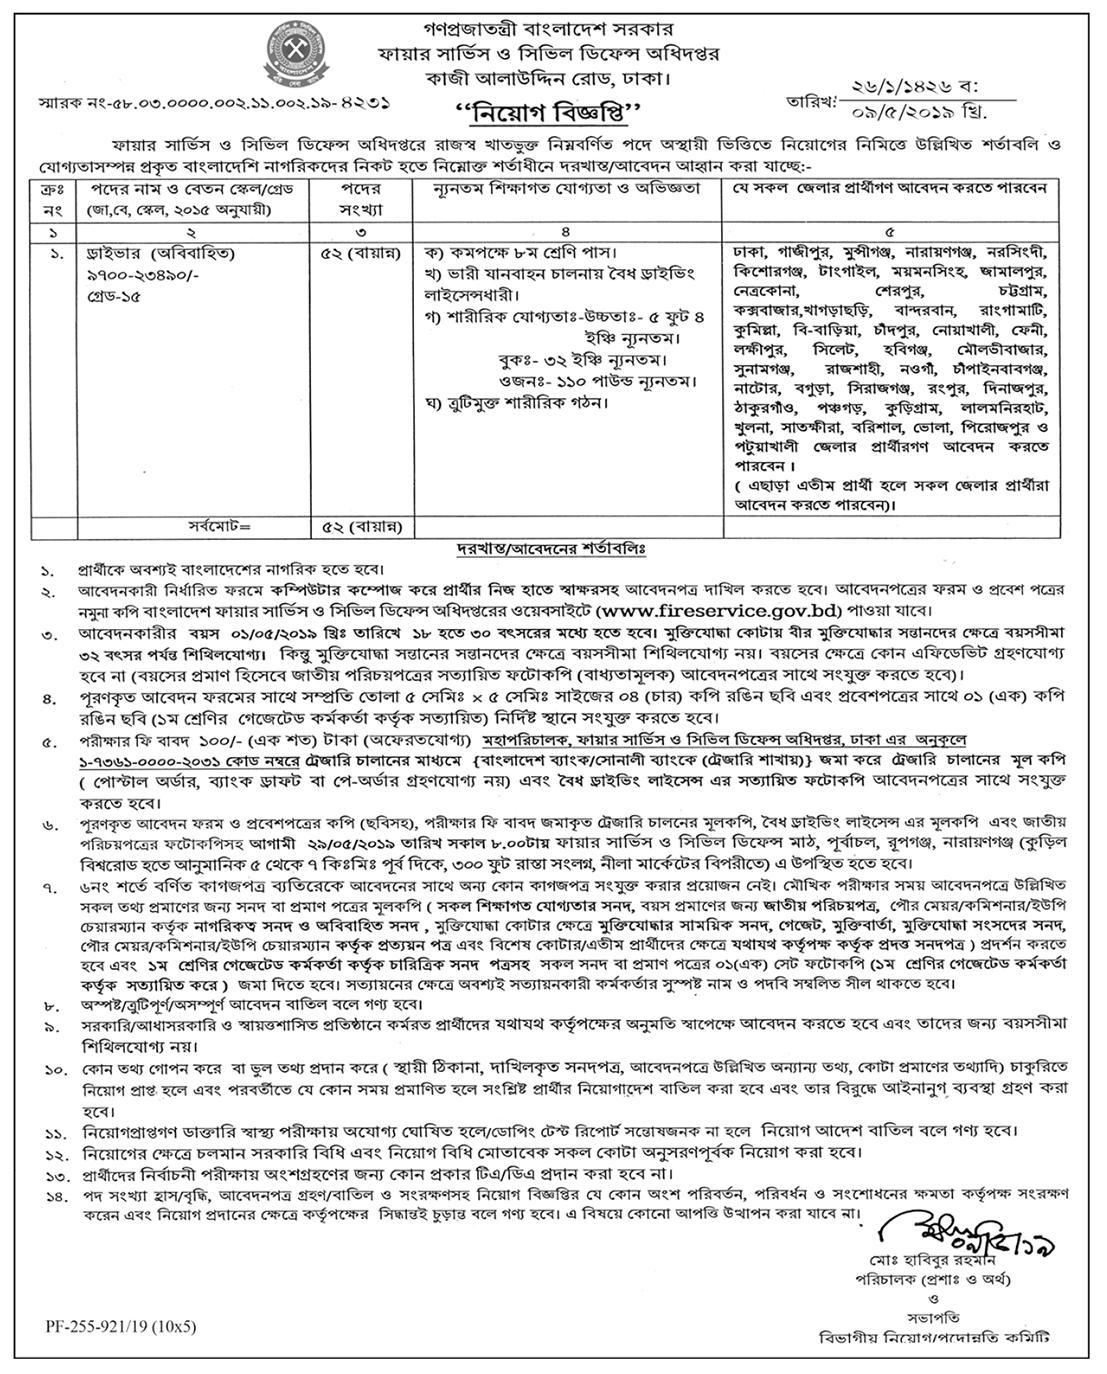 Bangladesh Fire Service and Civil Defence (FSCD) Job Circular 2019